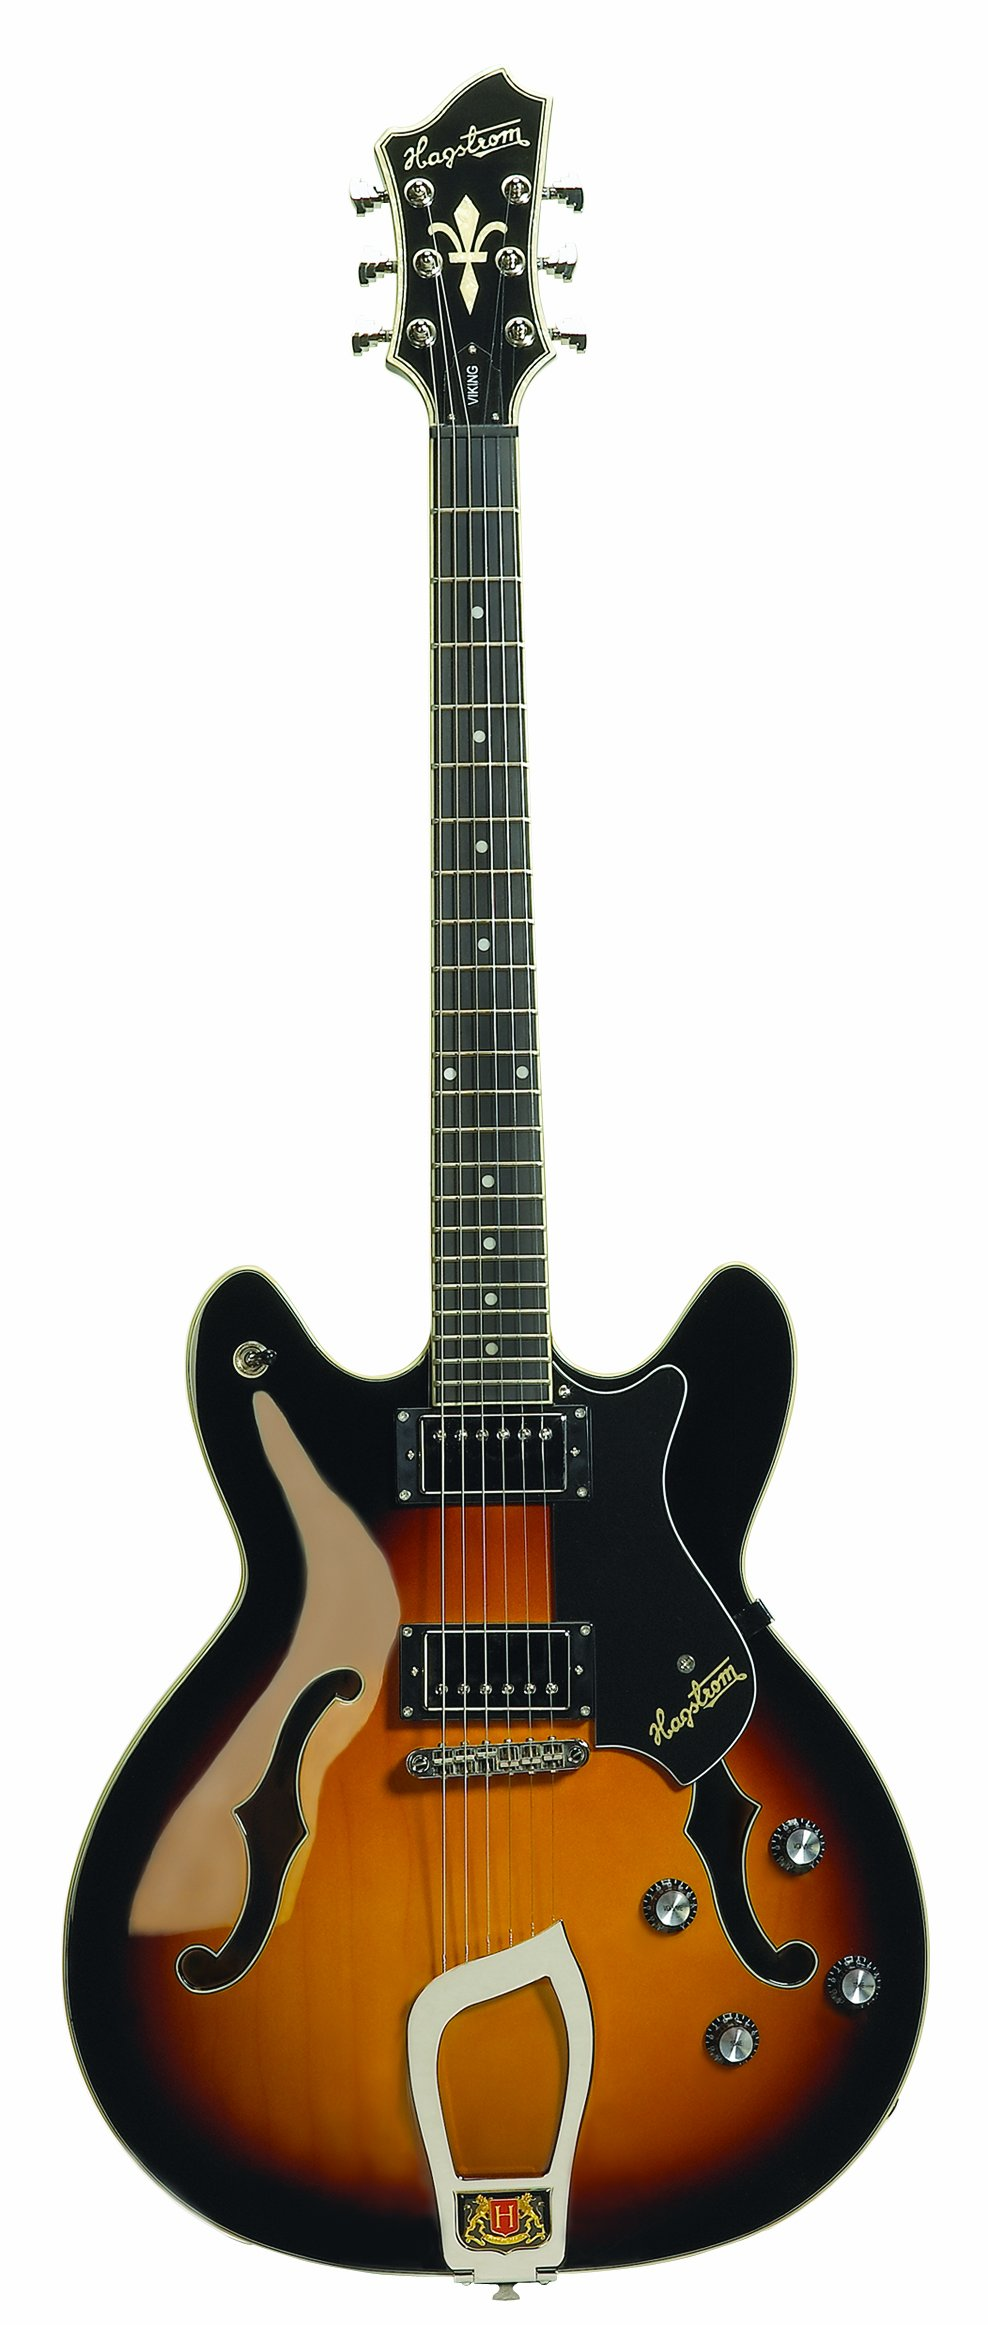 Hagstrom Viking Electric Guitar (Tobacco Sunburst) by Hagstrom (Image #1)